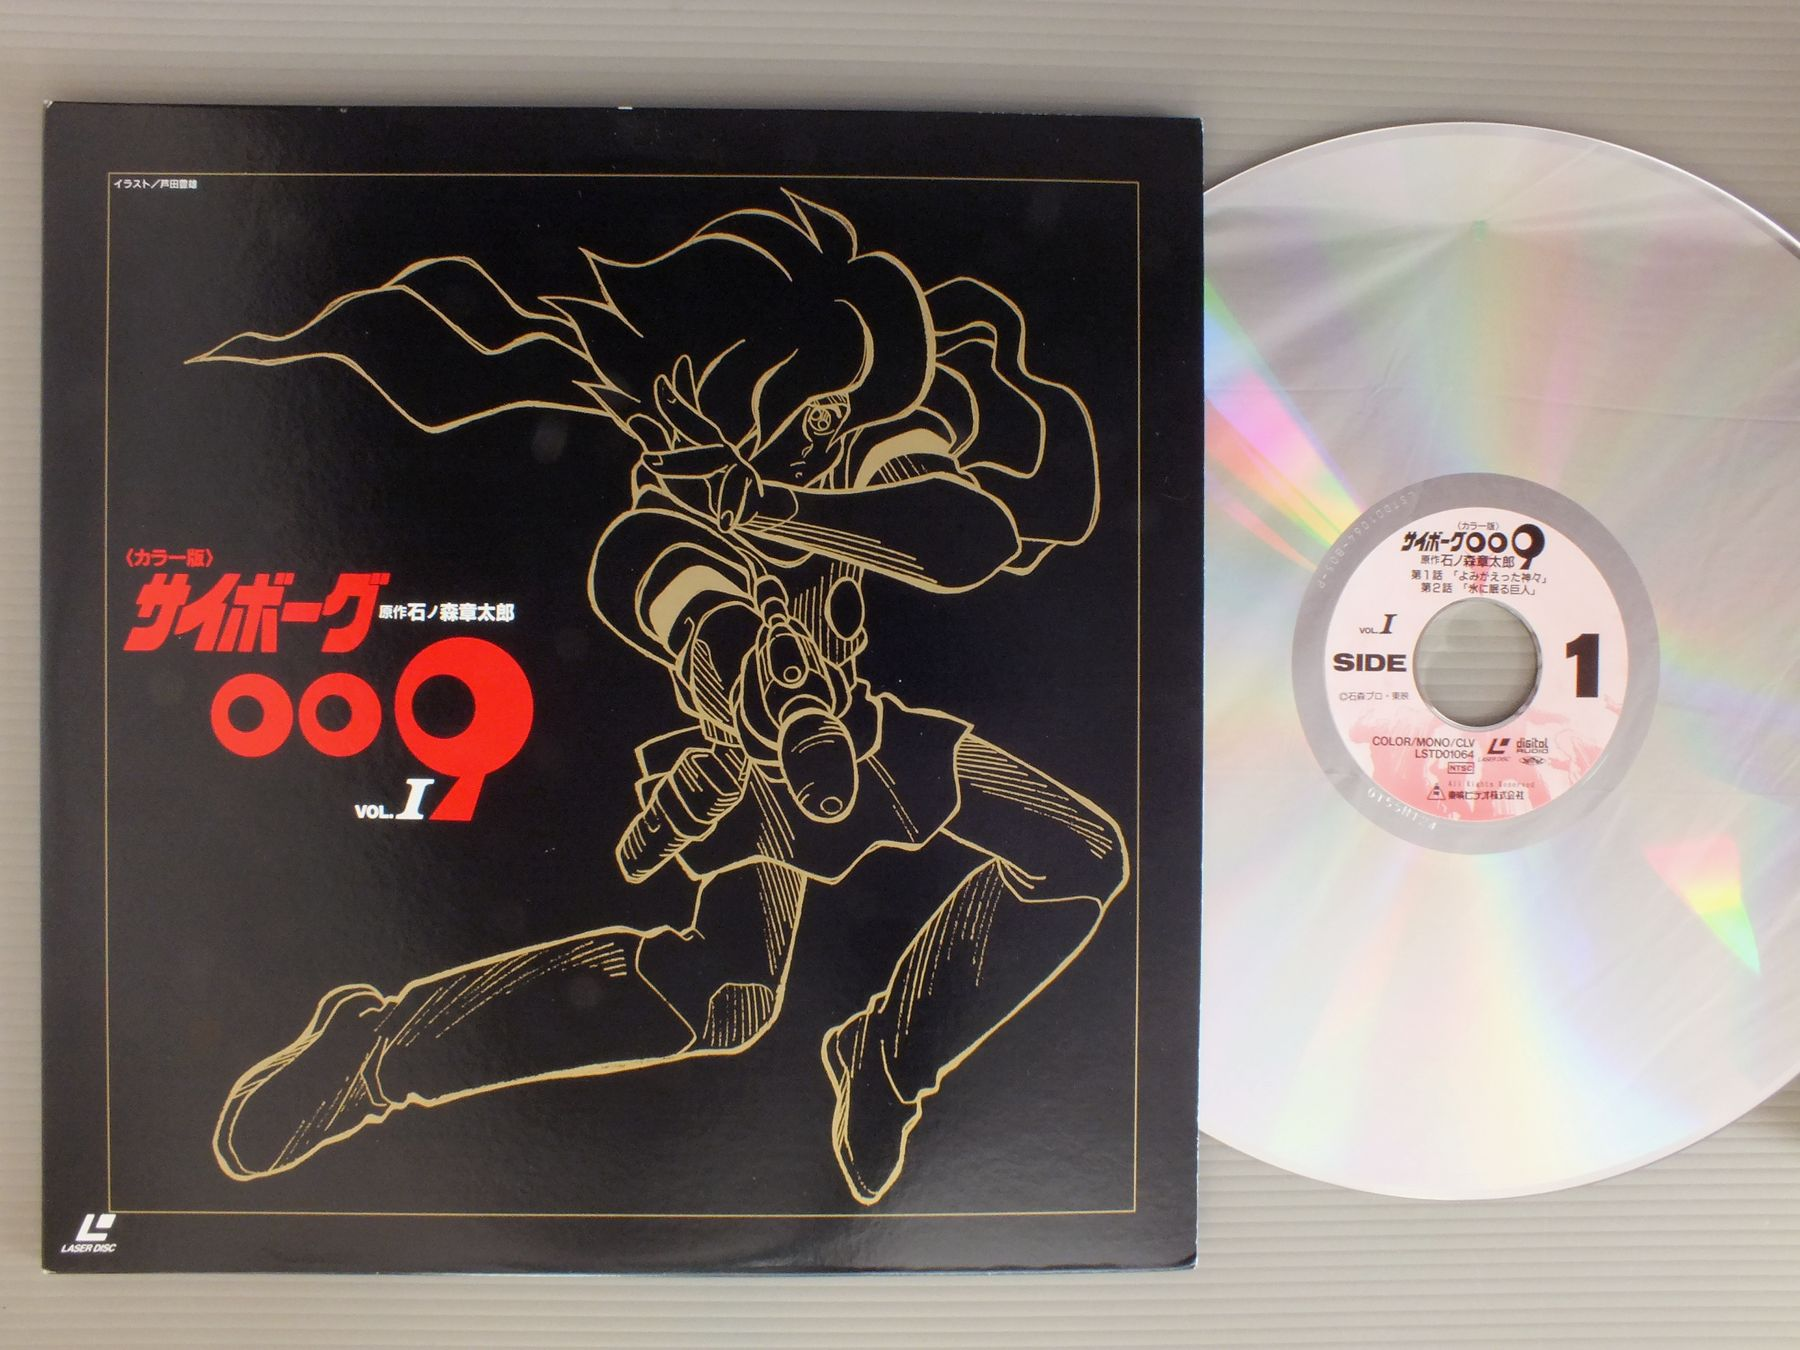 SHOTAROU ISHINOMORI - ANIME CYBORG 009 - Laser Disc